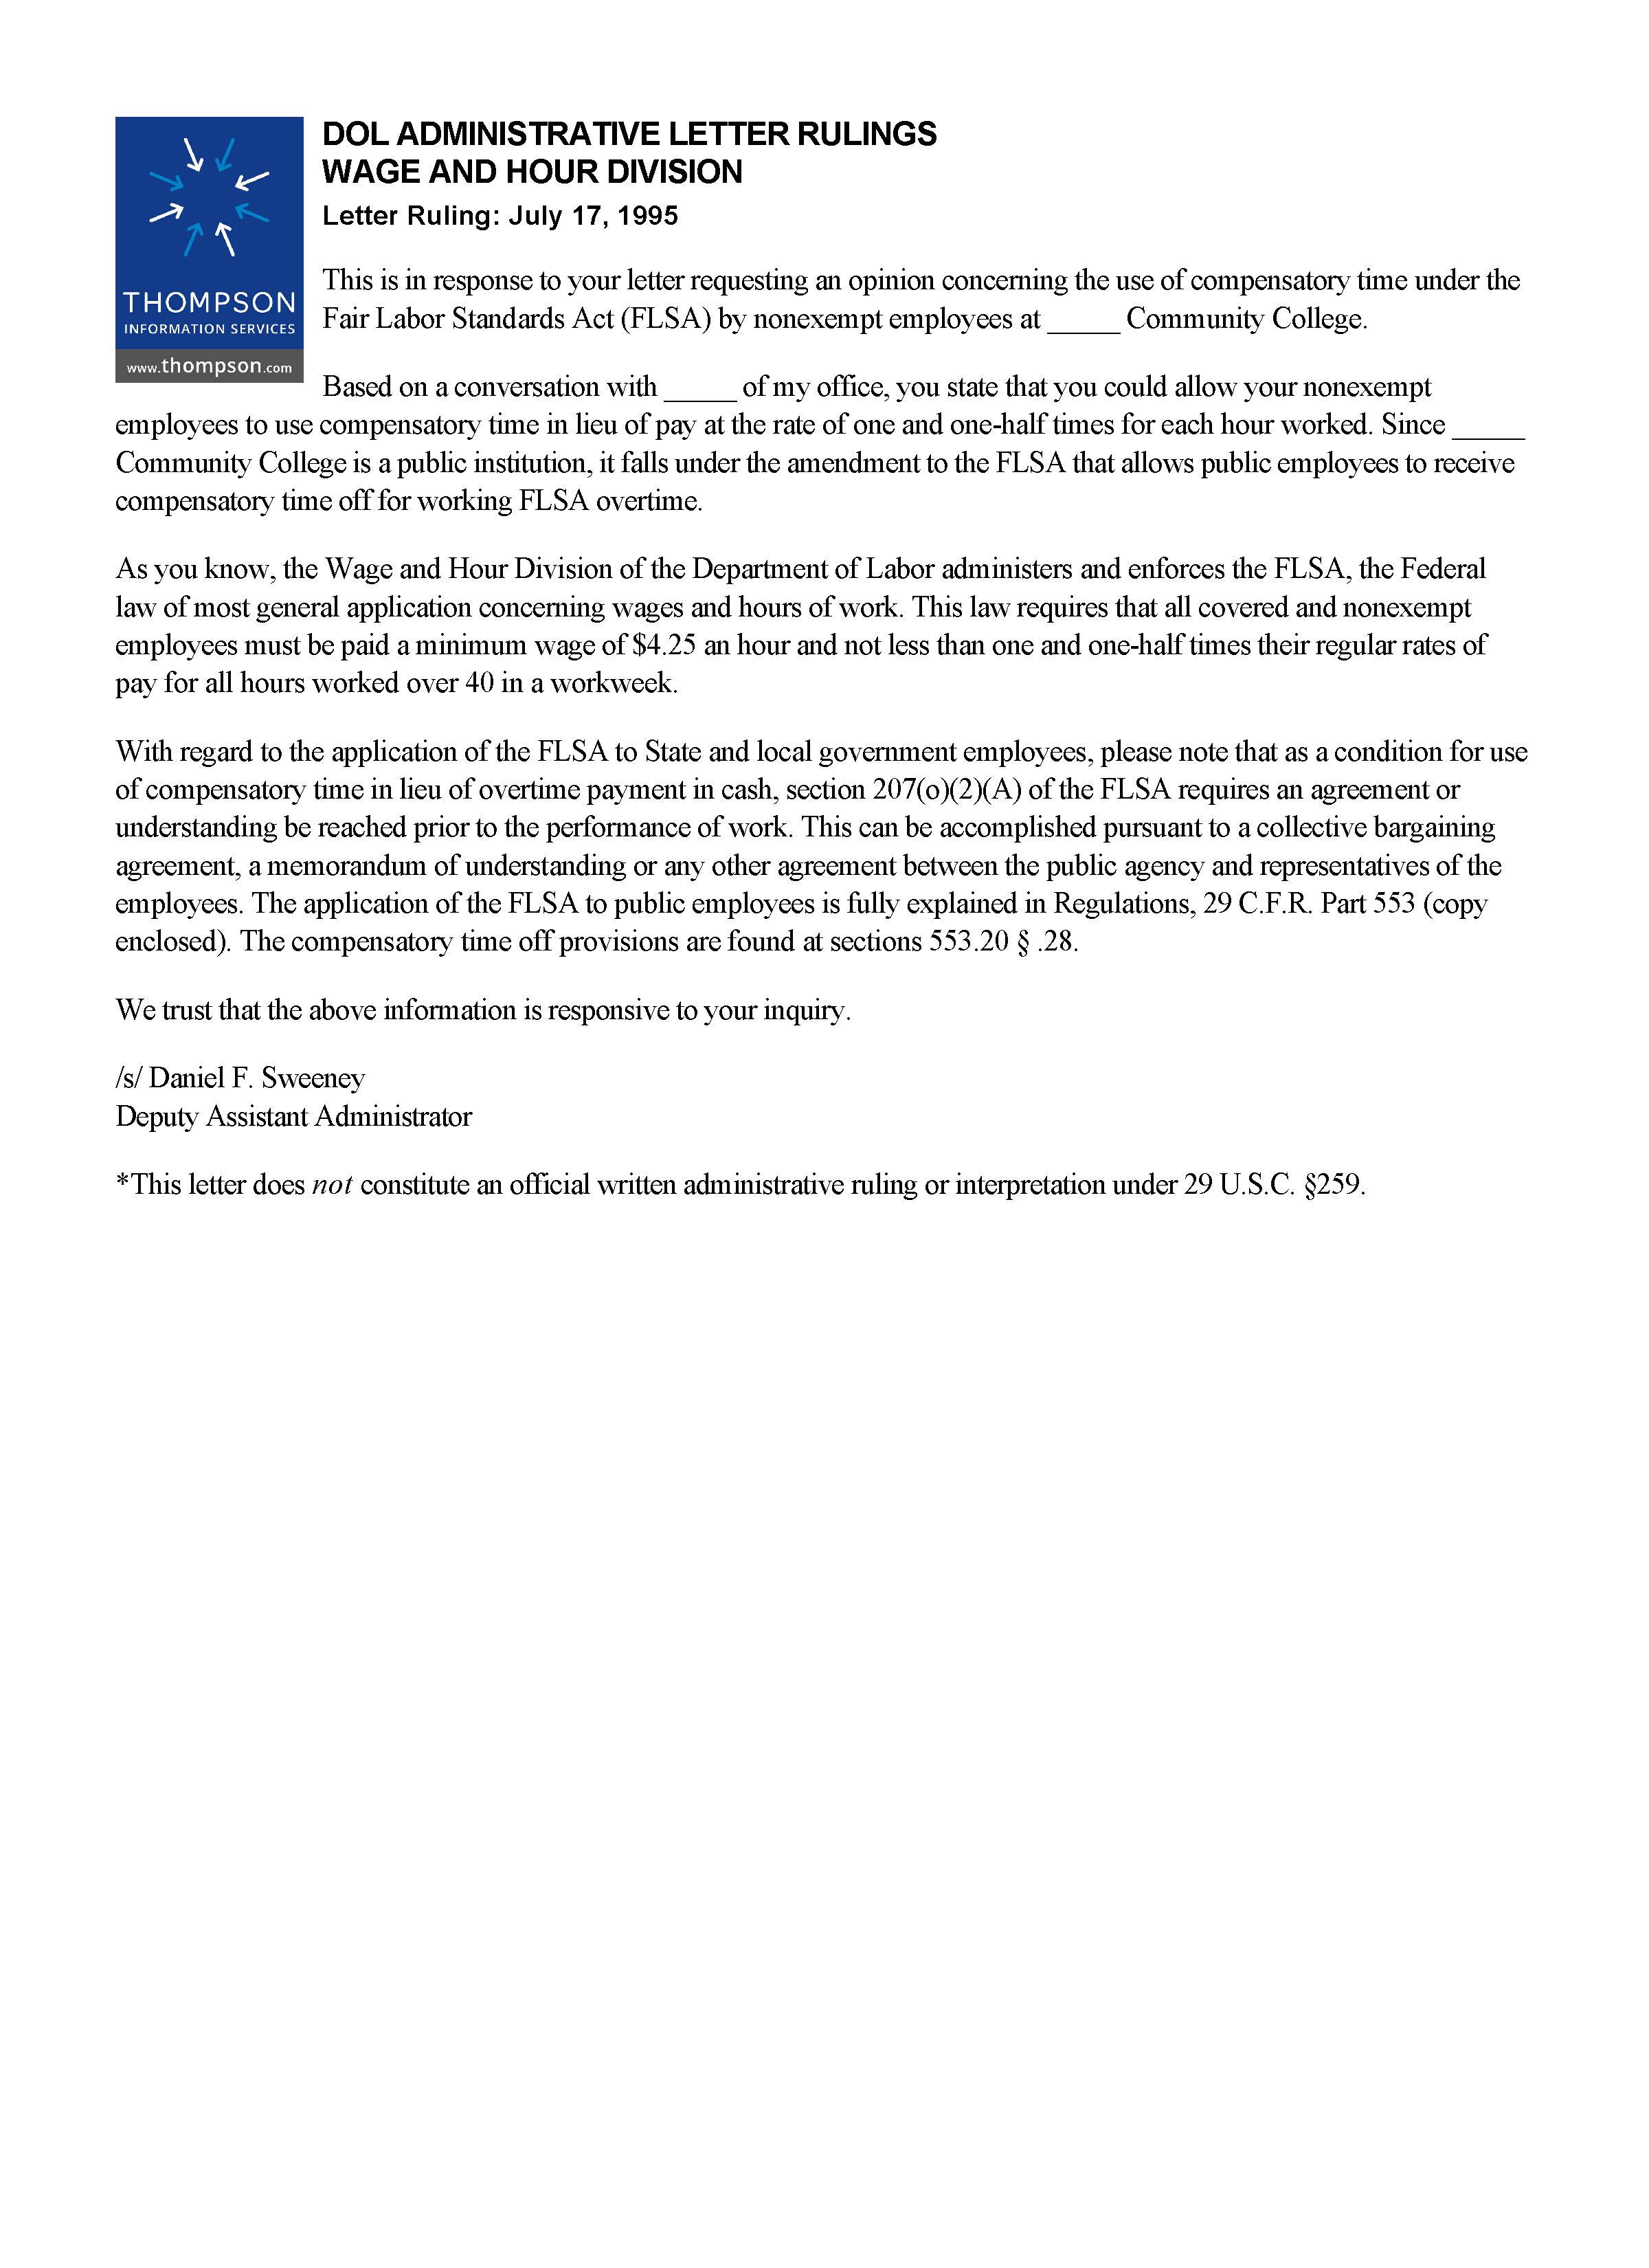 Letter Ruling: July 17, 1995 | Alexander Street, a ProQuest